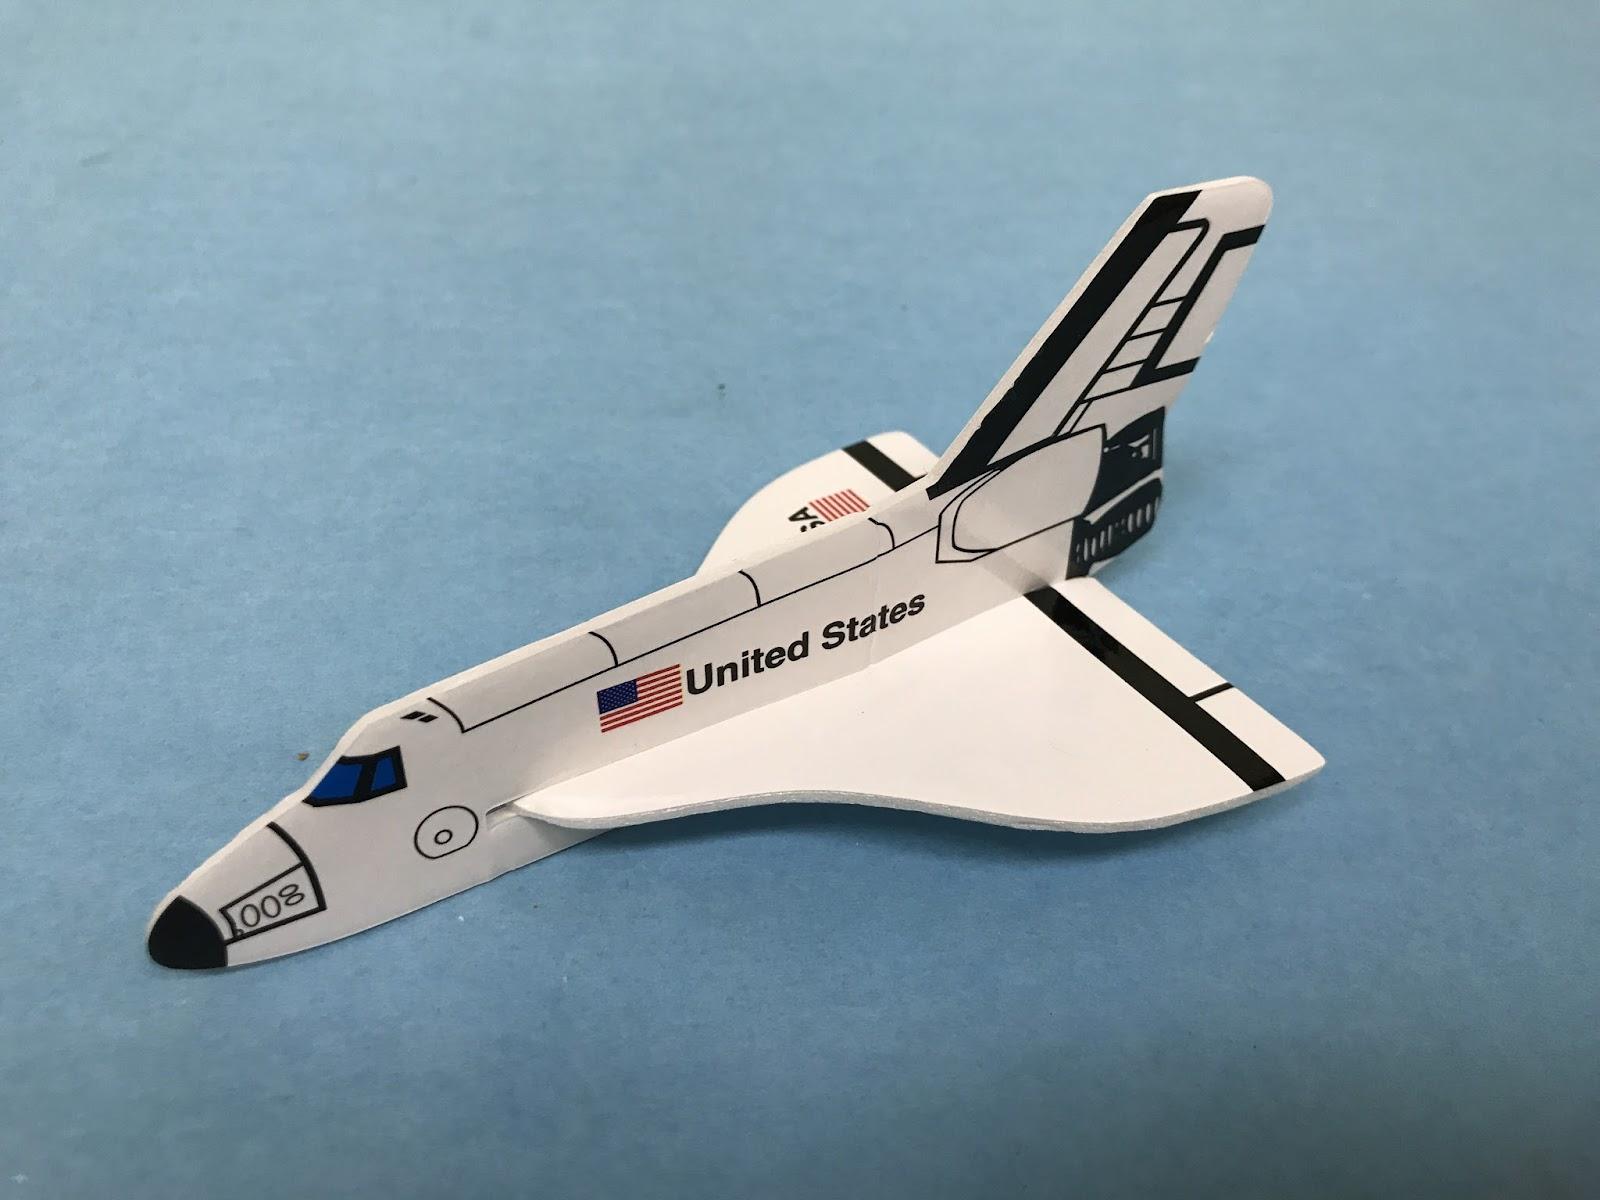 Space shuttle gliders 12.JPG